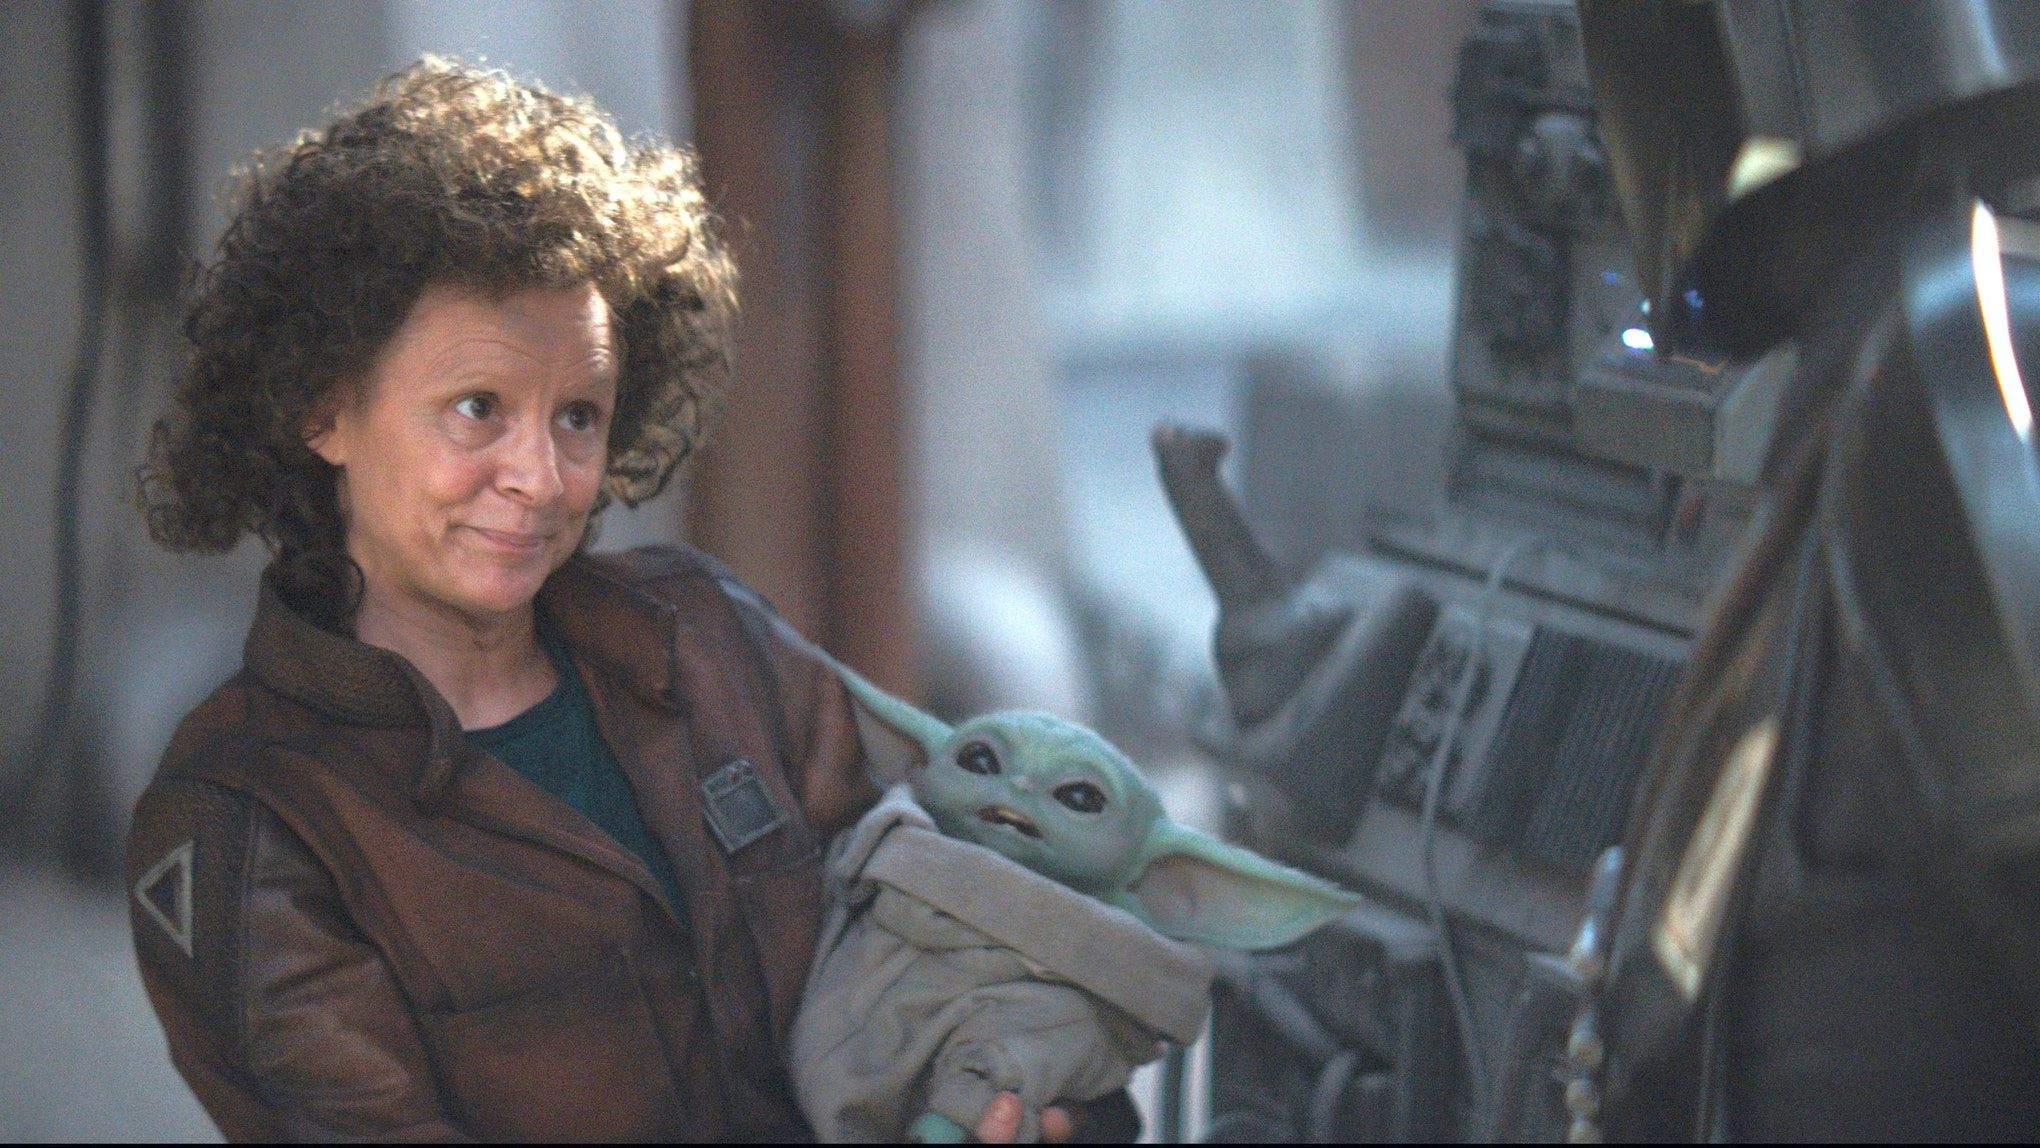 Here S Why The Mandalorian Fans Think Amy Sedaris Character Looks Familiar Mandalorian Star Wars Love Star Wars